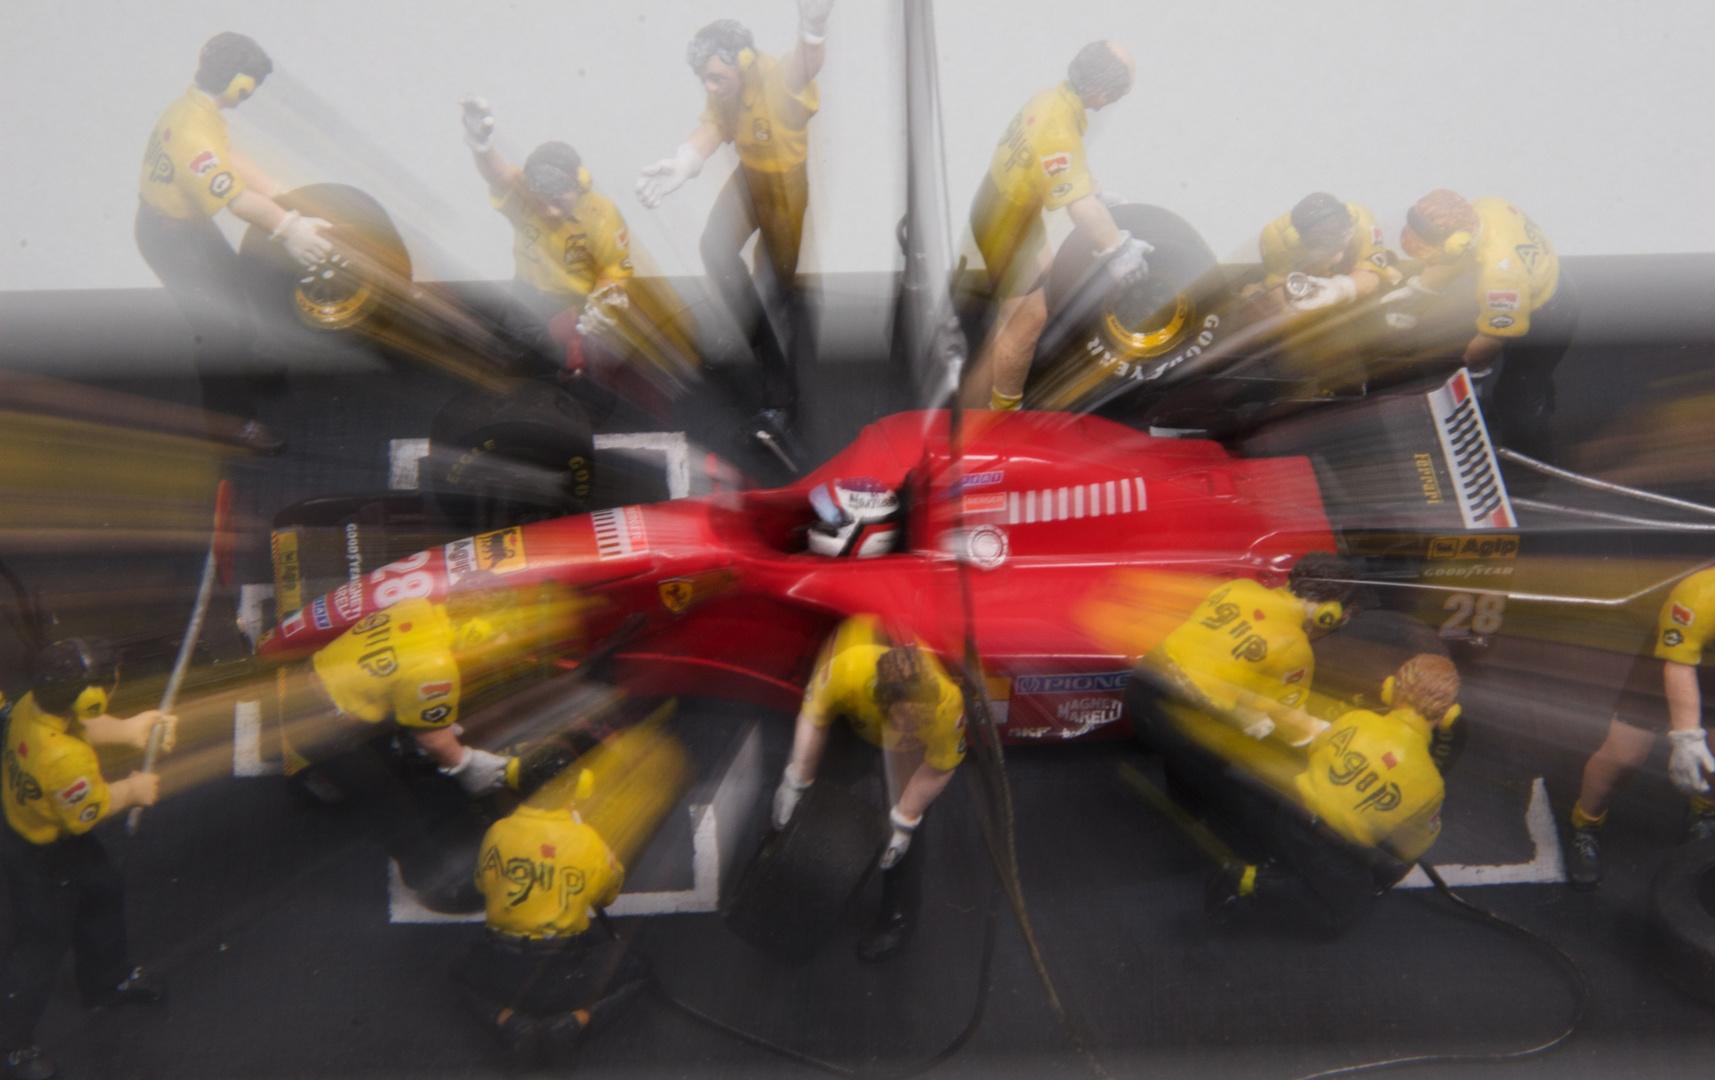 Ferrari beim Boxenstopp - 3. Versuch